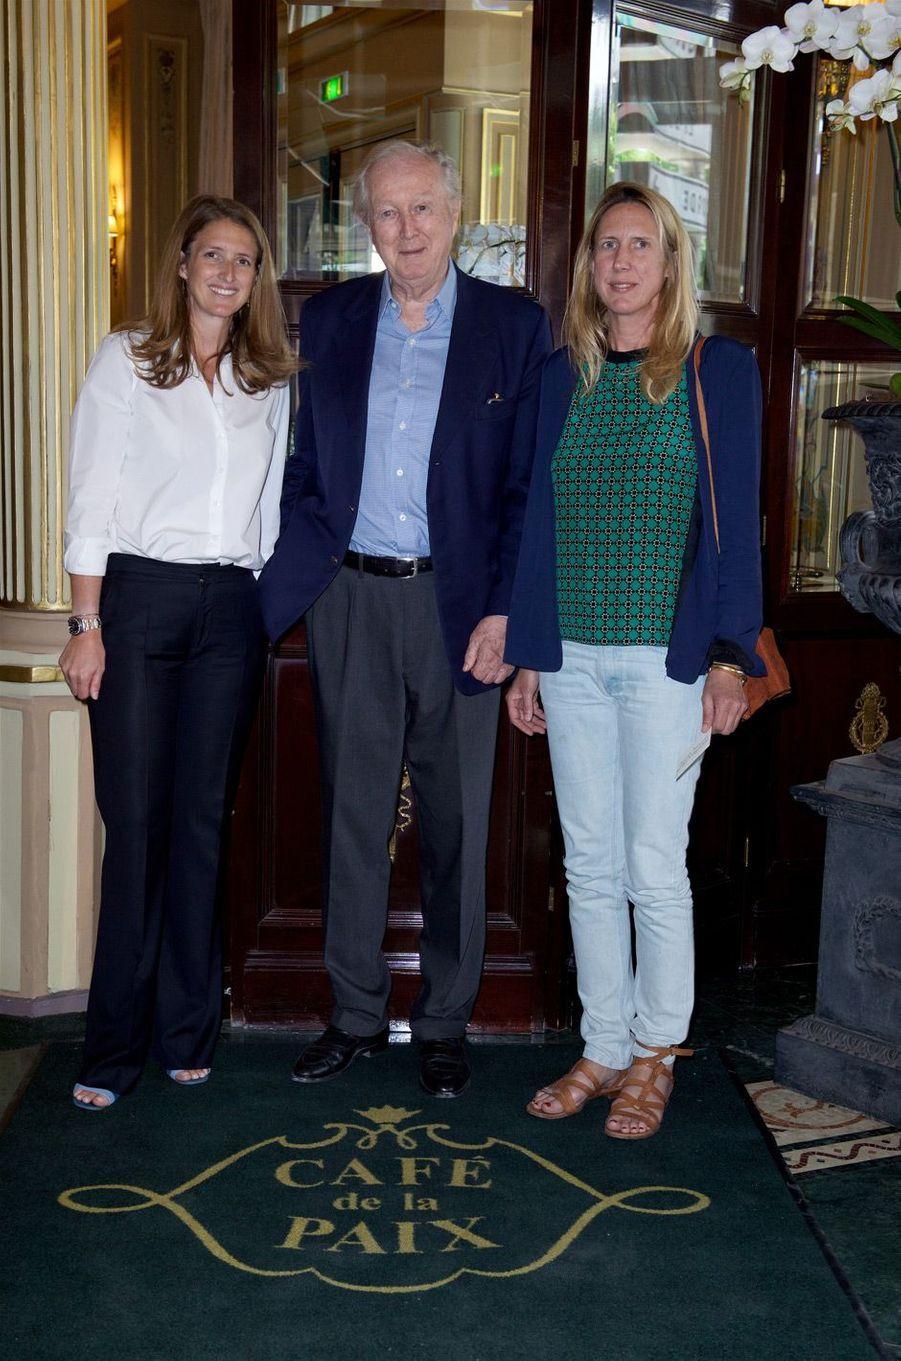 Le prince Robin zu Sayn Wittgenstein et ses filles Zelda et Natascha.